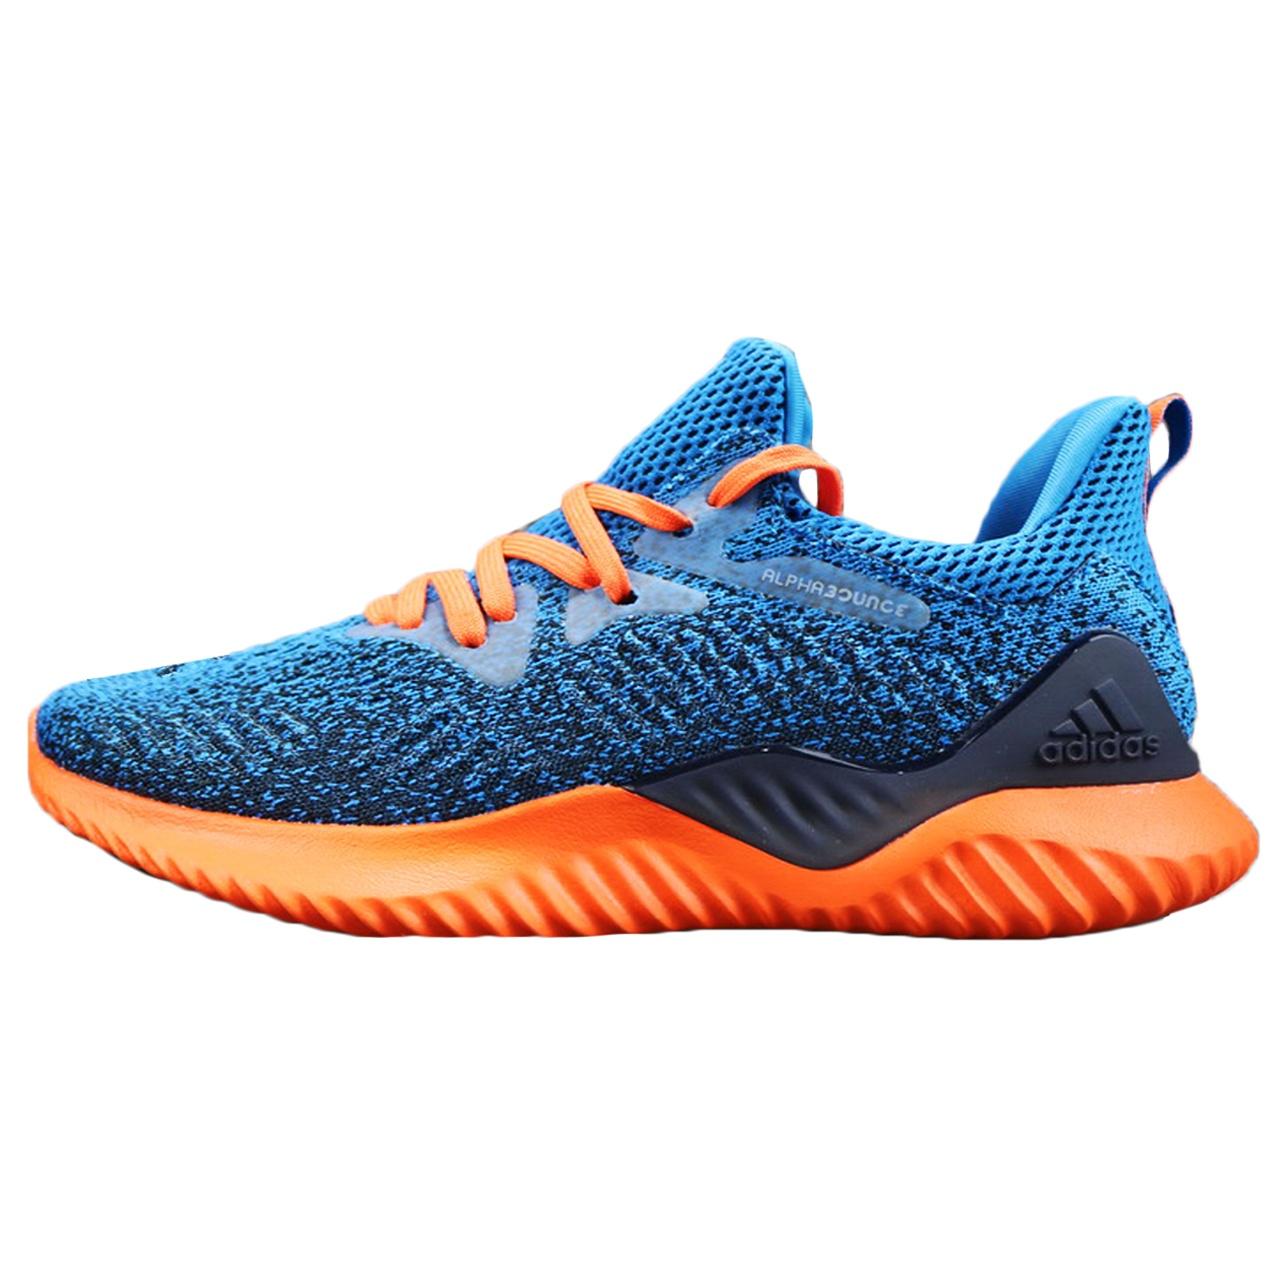 کفش مخصوص دویدن زنانه آدیداس مدل Alpha Bounce کد 67-76665